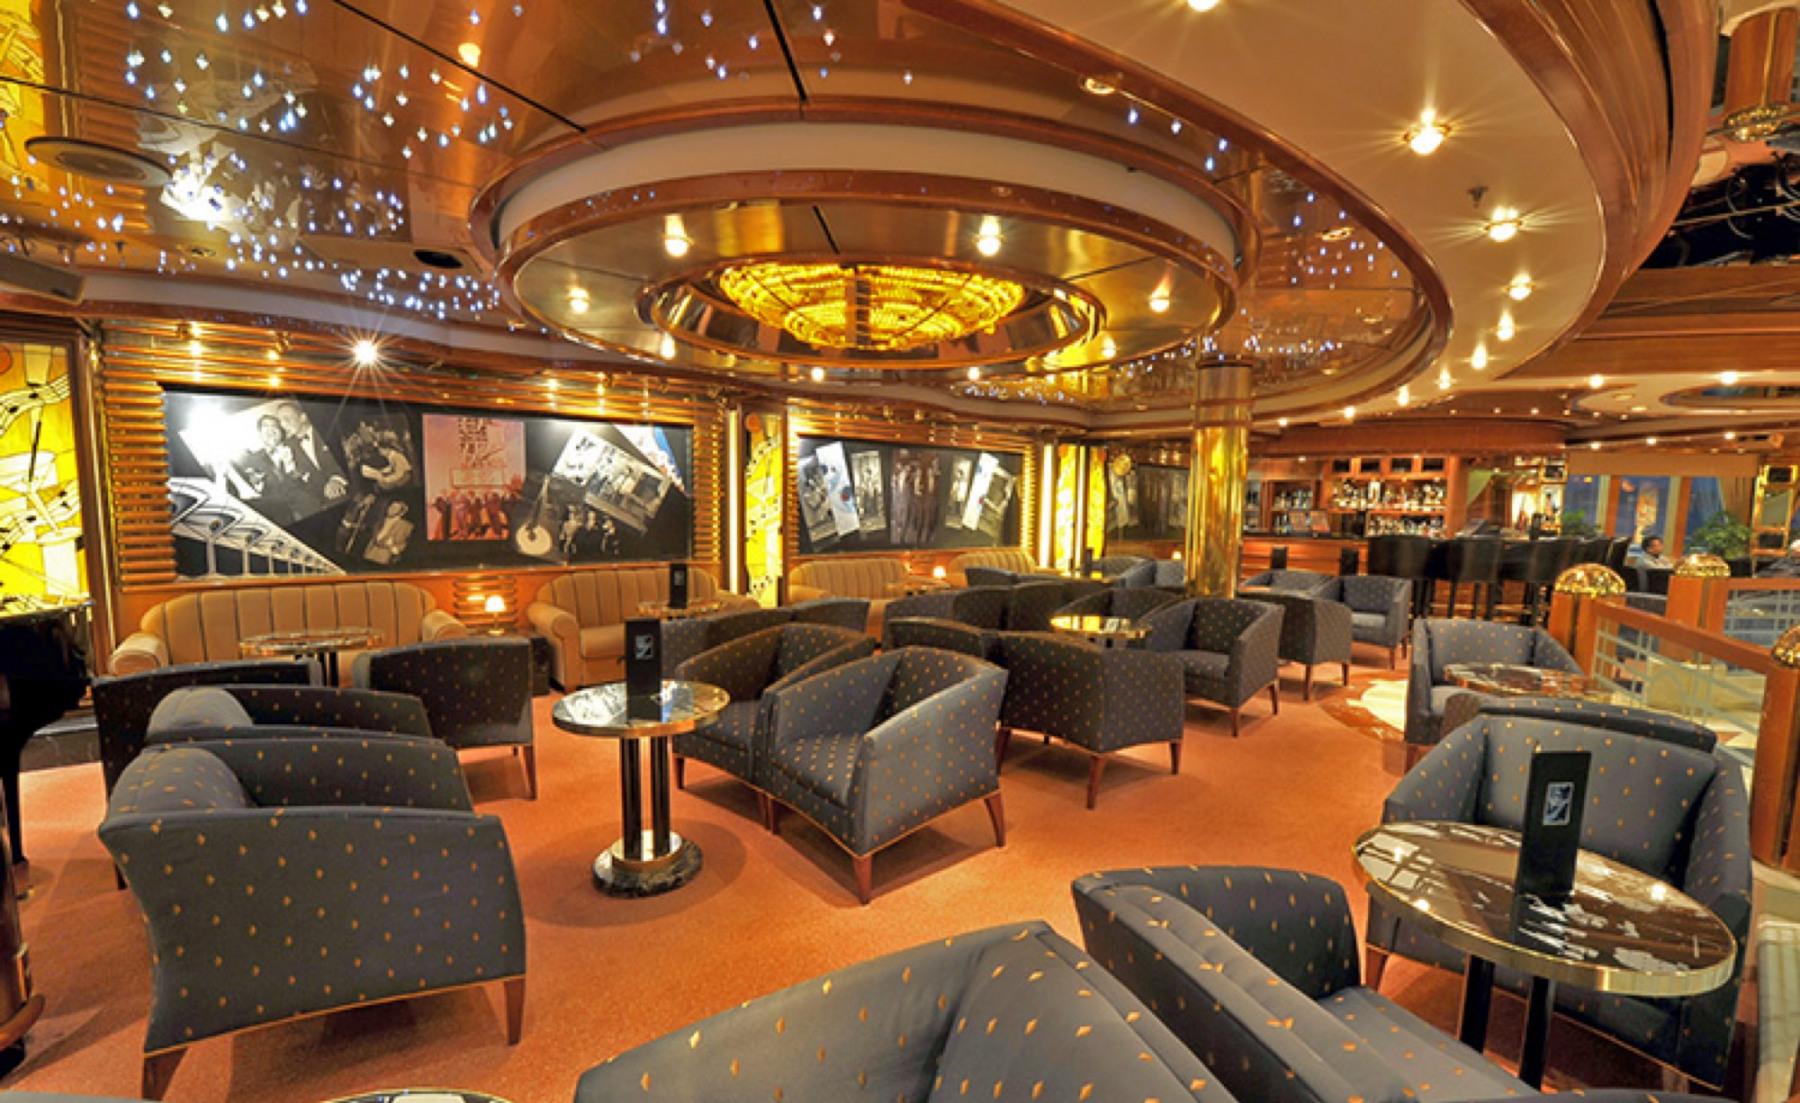 Princess Cruises Royal Class Interior crooners_bar_lg.JPG